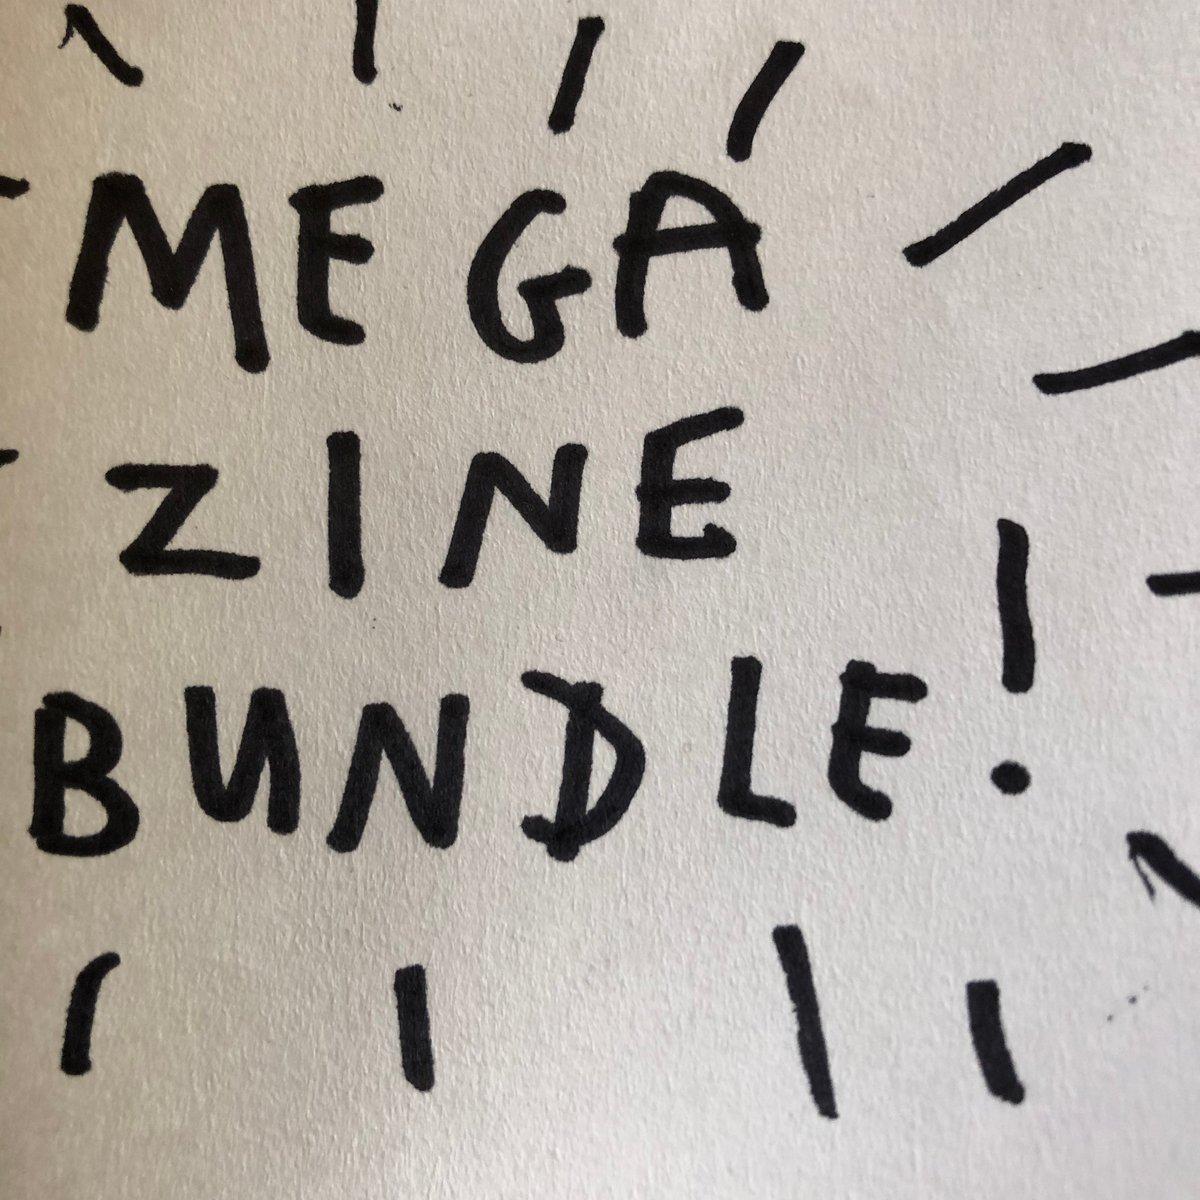 MEGA ZINE BUNDLE (3 zines)